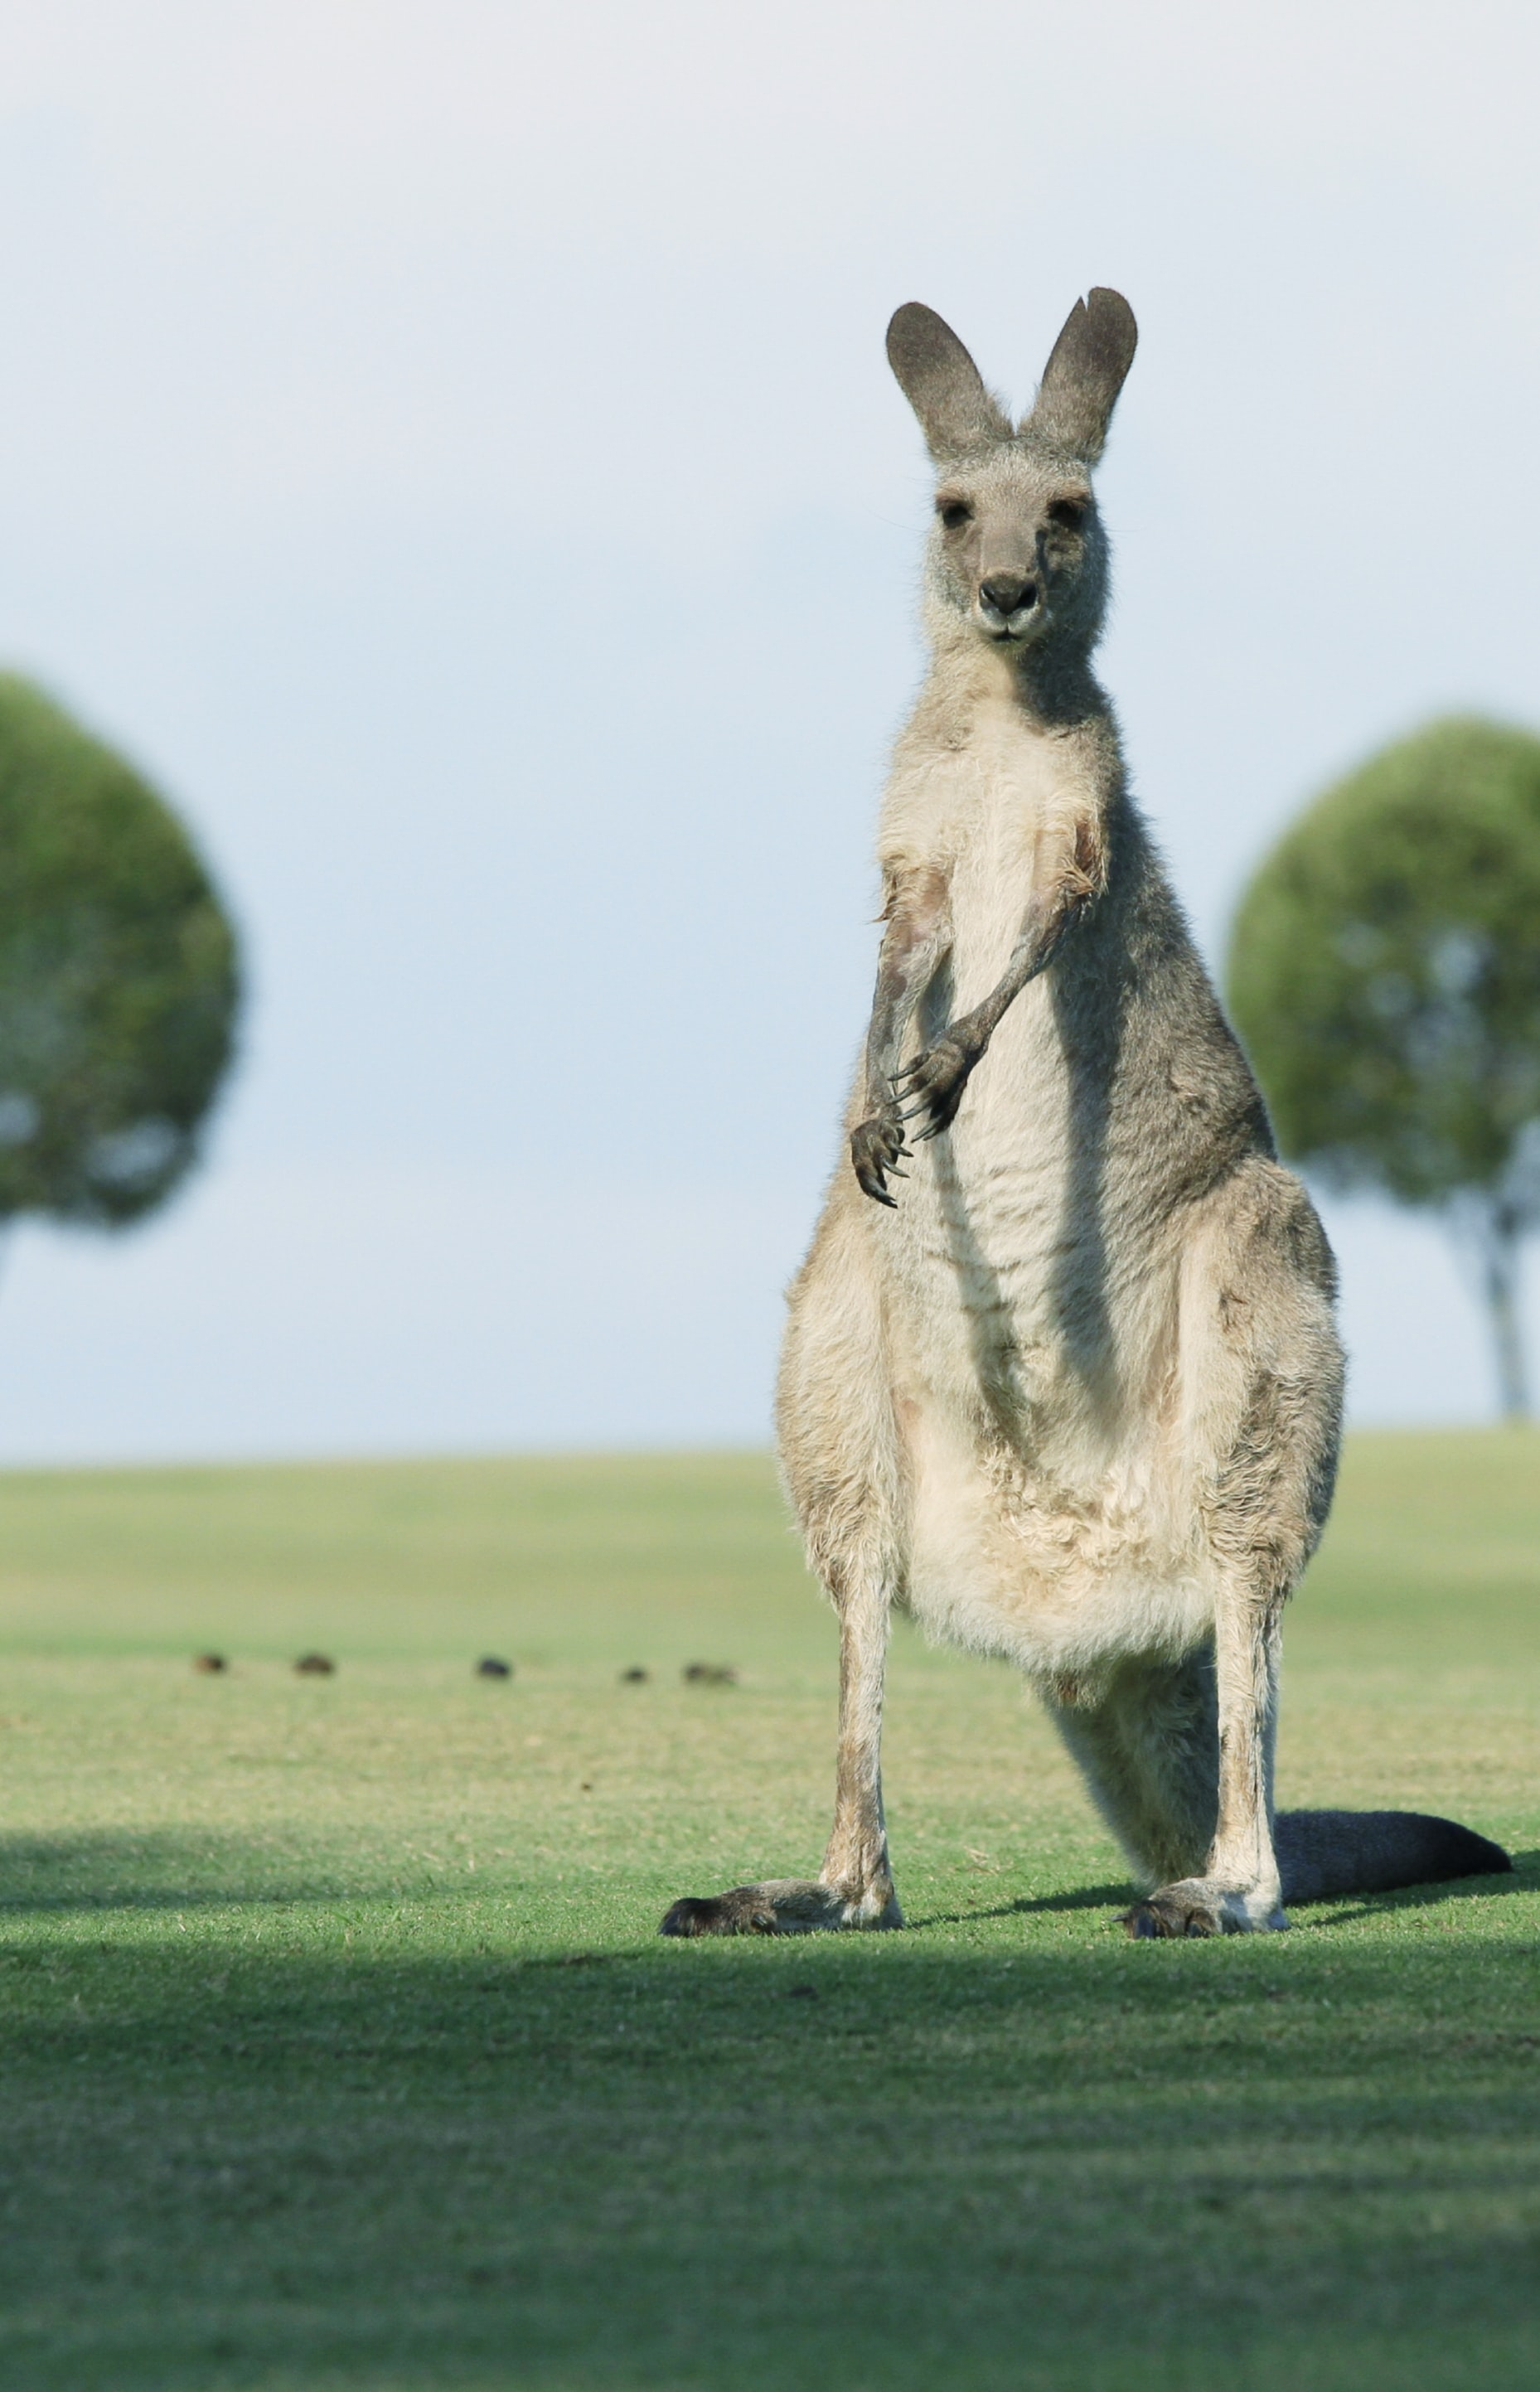 brown goat standing on green grass